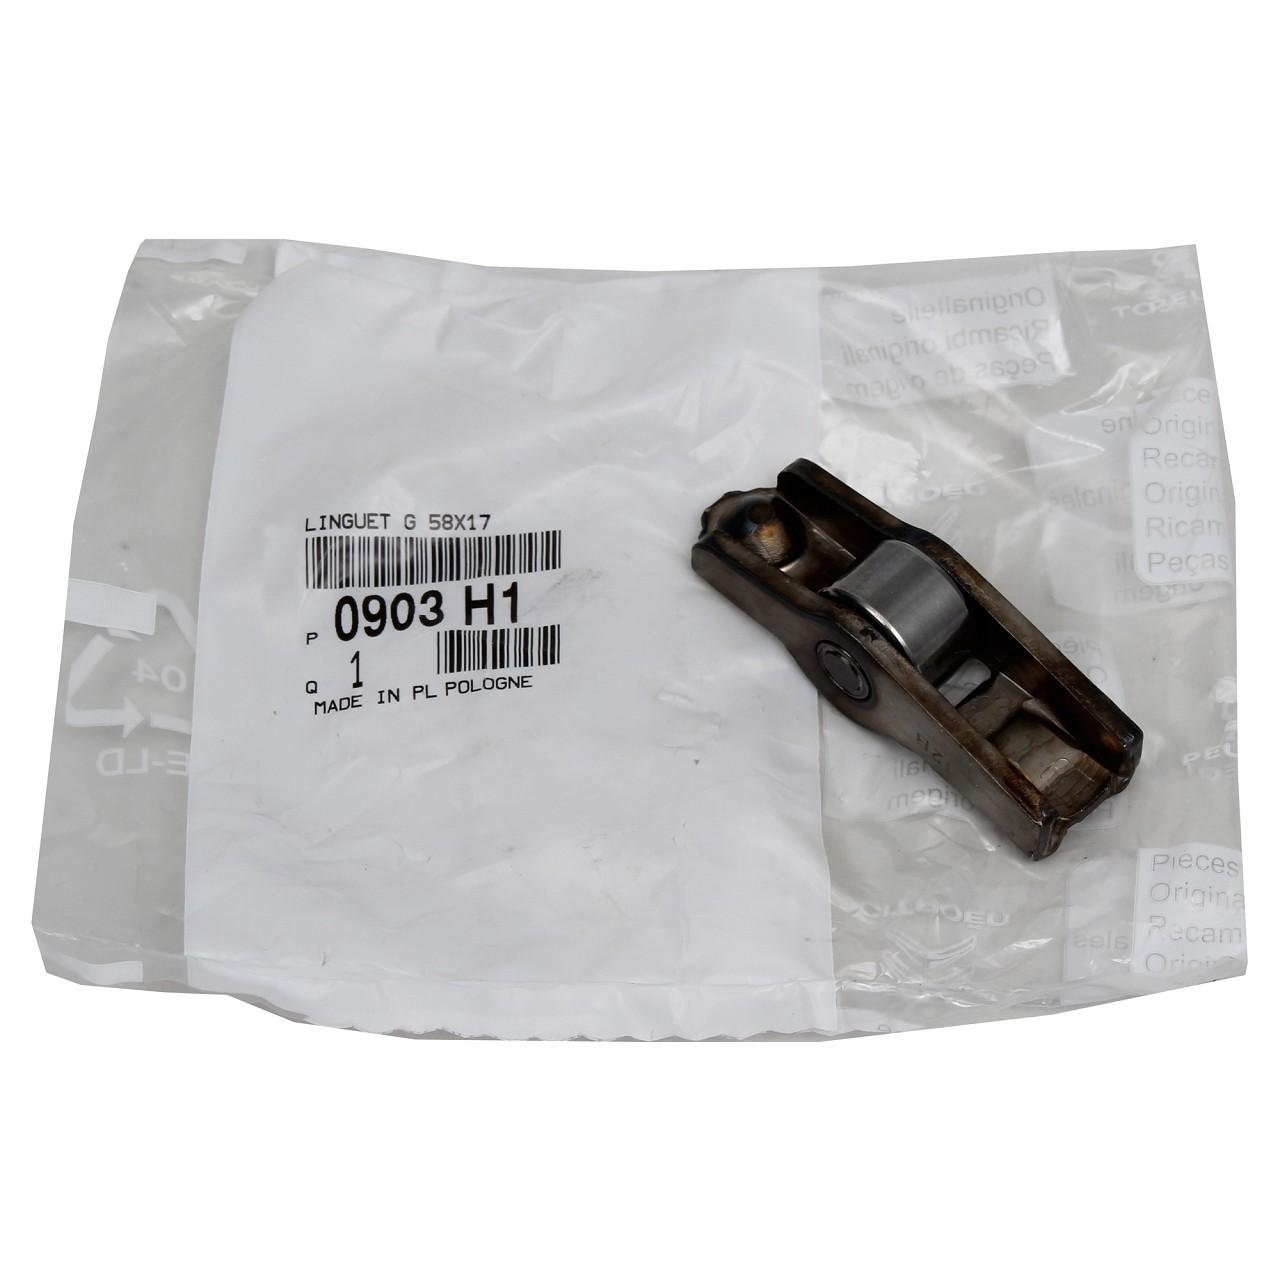 ORIGINAL Citroen Peugeot Kipphebel Schlepphebel 0903.H1 für 2.0 HDi 2.2 HDi